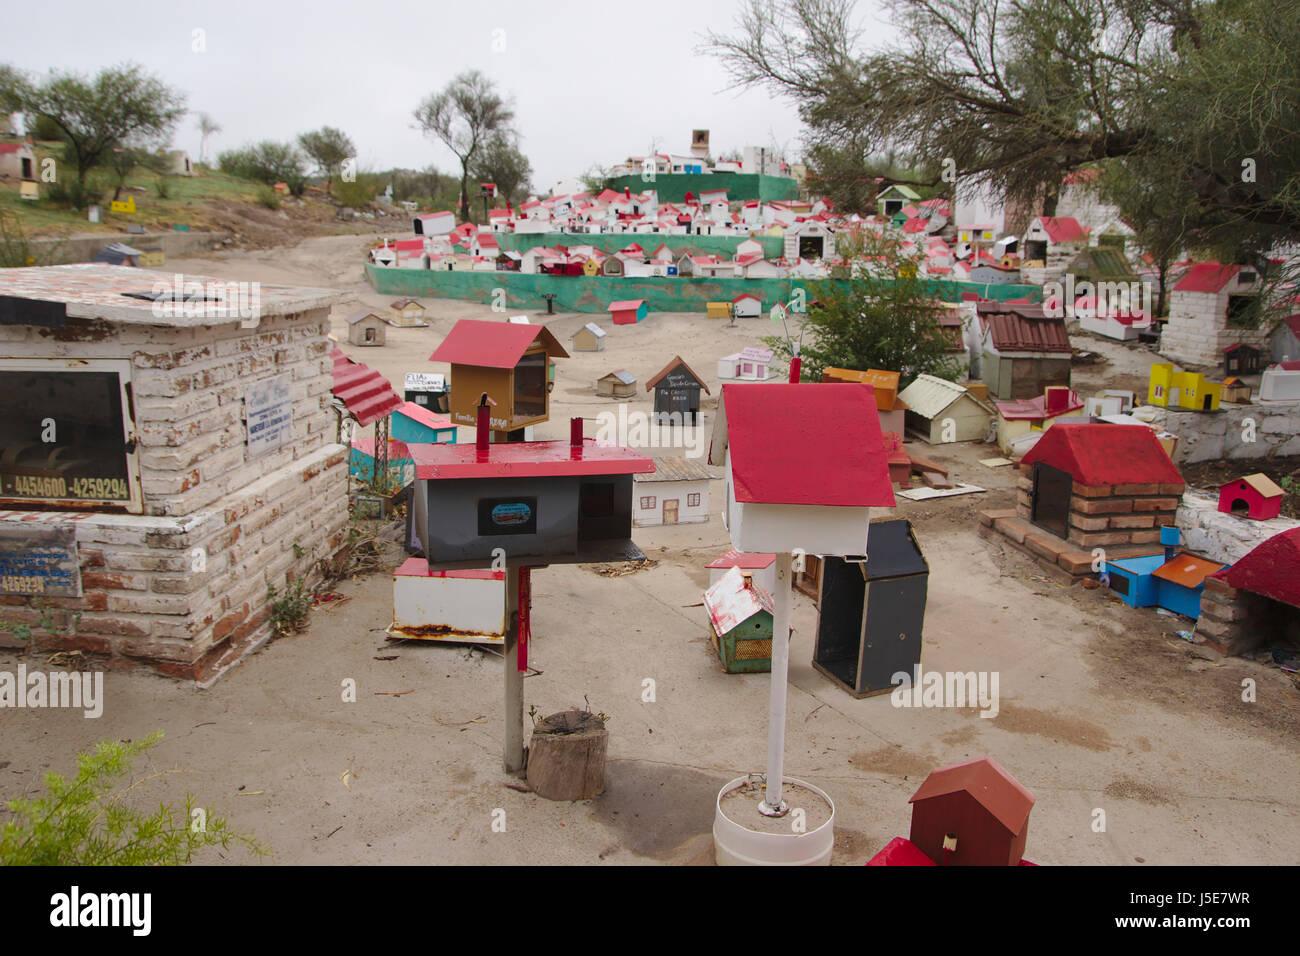 Shrines for Difunta Correa in Vallecito, San Juan Province, Argentina - Stock Image